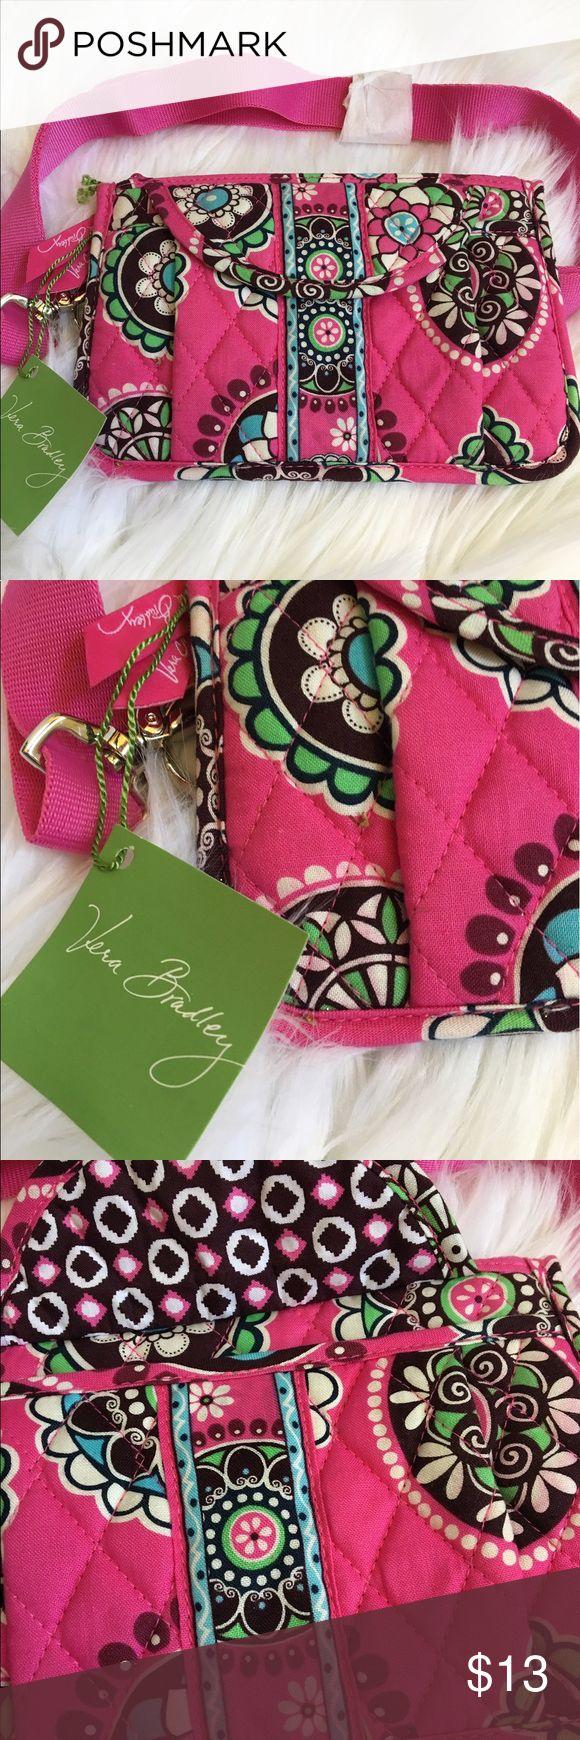 "Vera Bradley Travel Bag Belt Really cute Vera Bradley travel bag belt can be used for travel or so many other uses. Width, 7"". Height, 4 1/2"". Vera Bradley Bags Travel Bags"